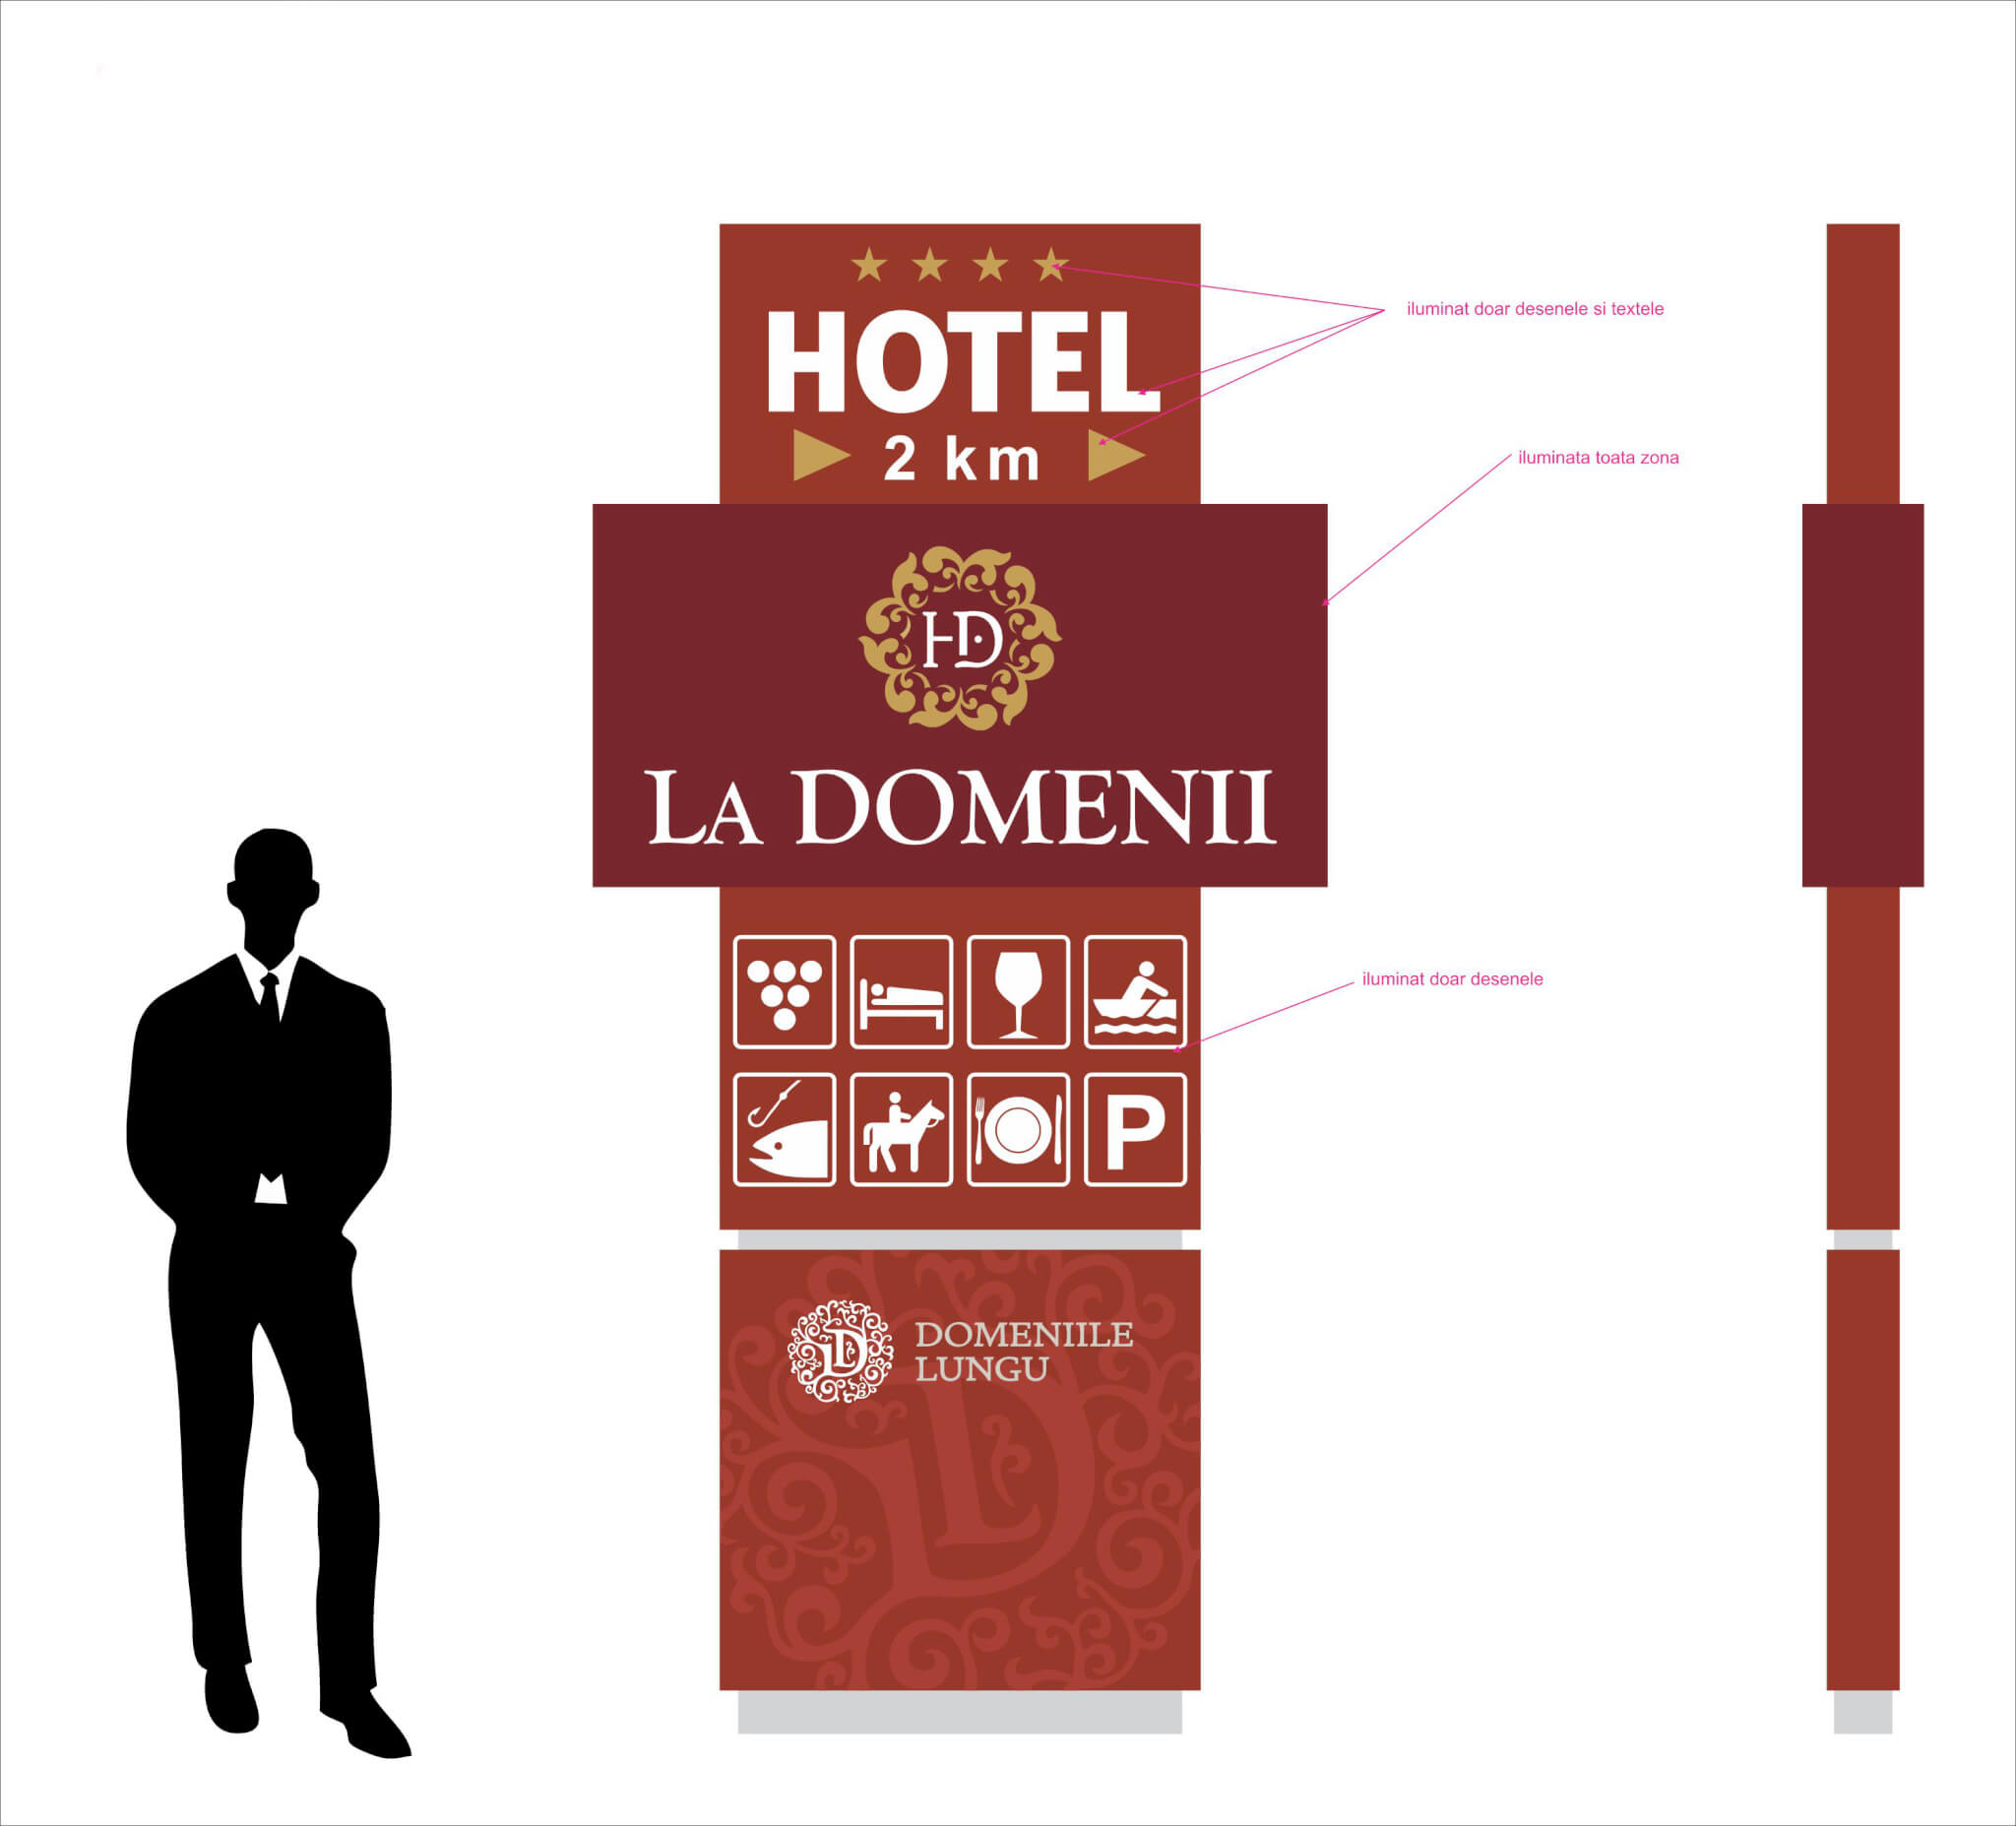 Hotel La Domenii Cryo Web Advertising